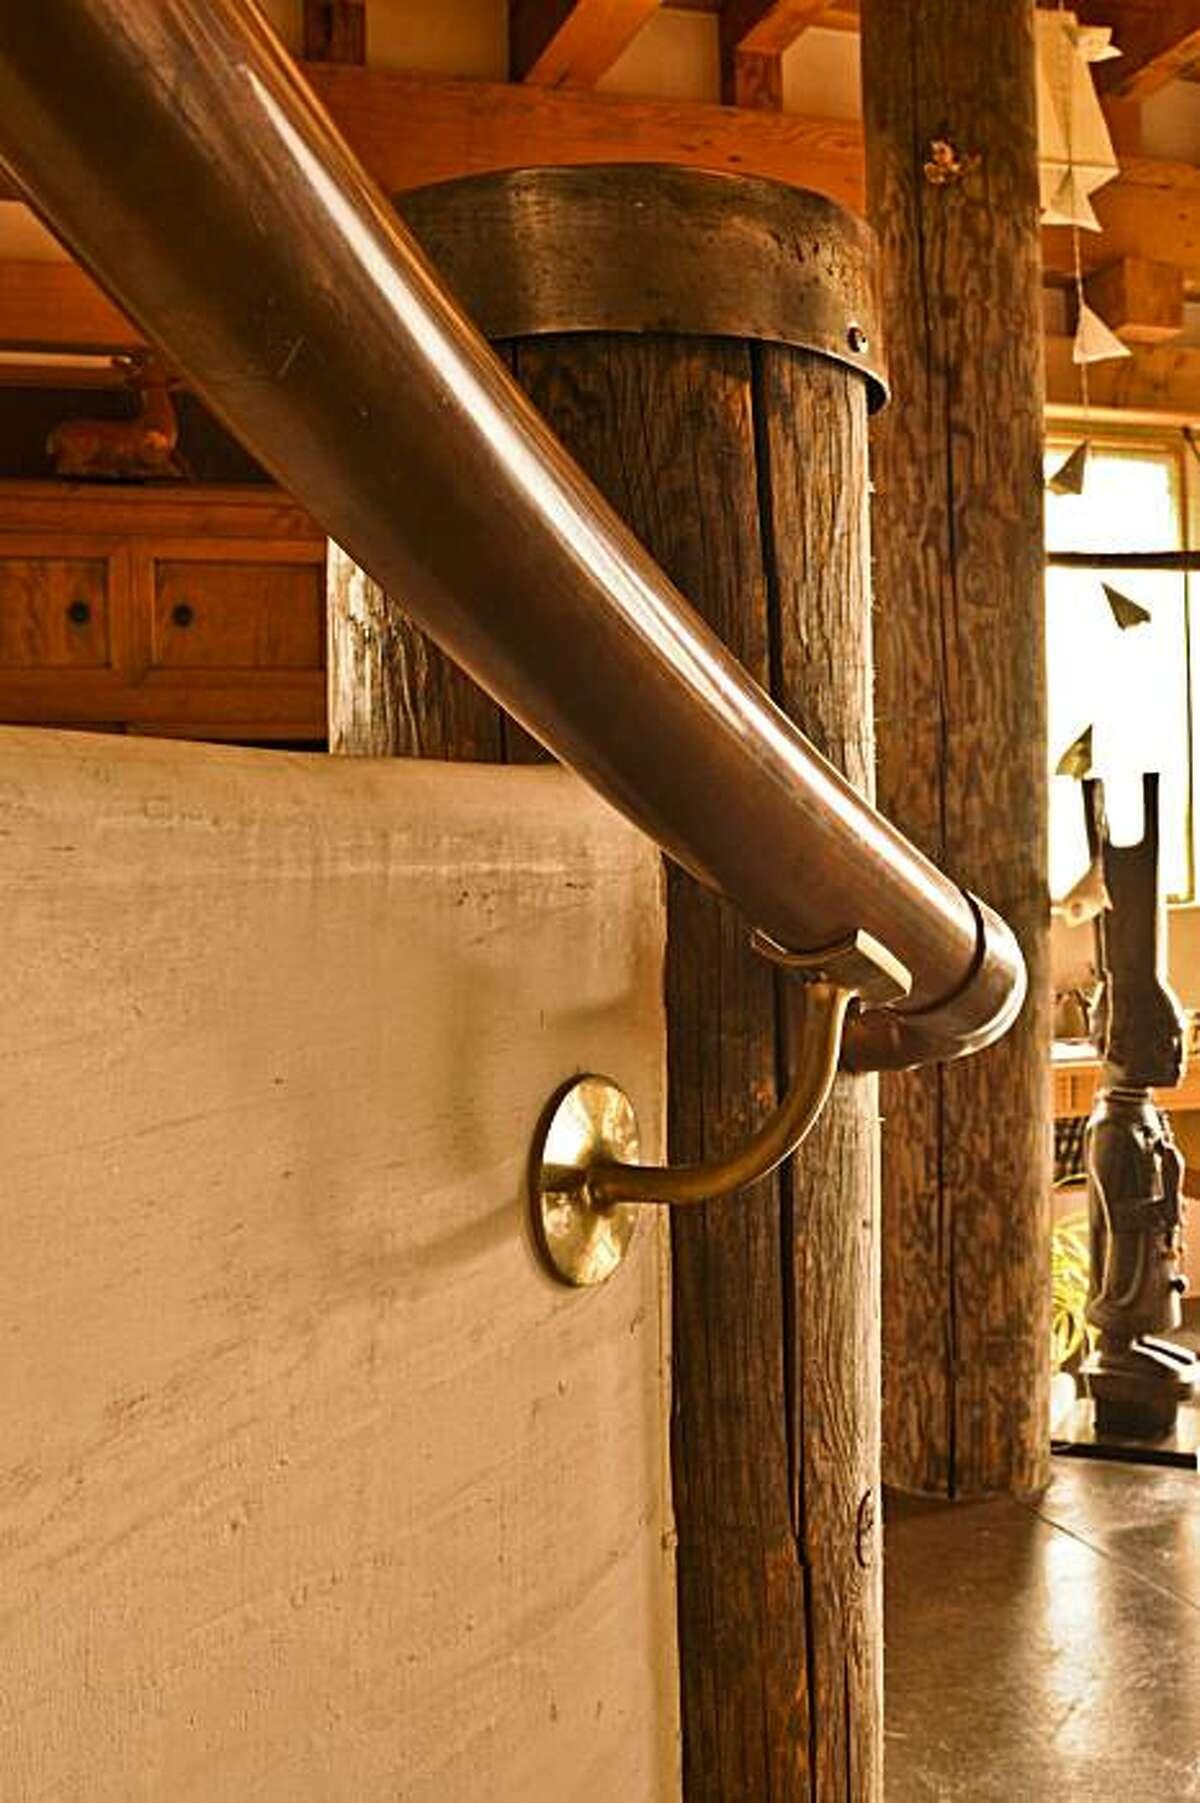 Copper tube railing